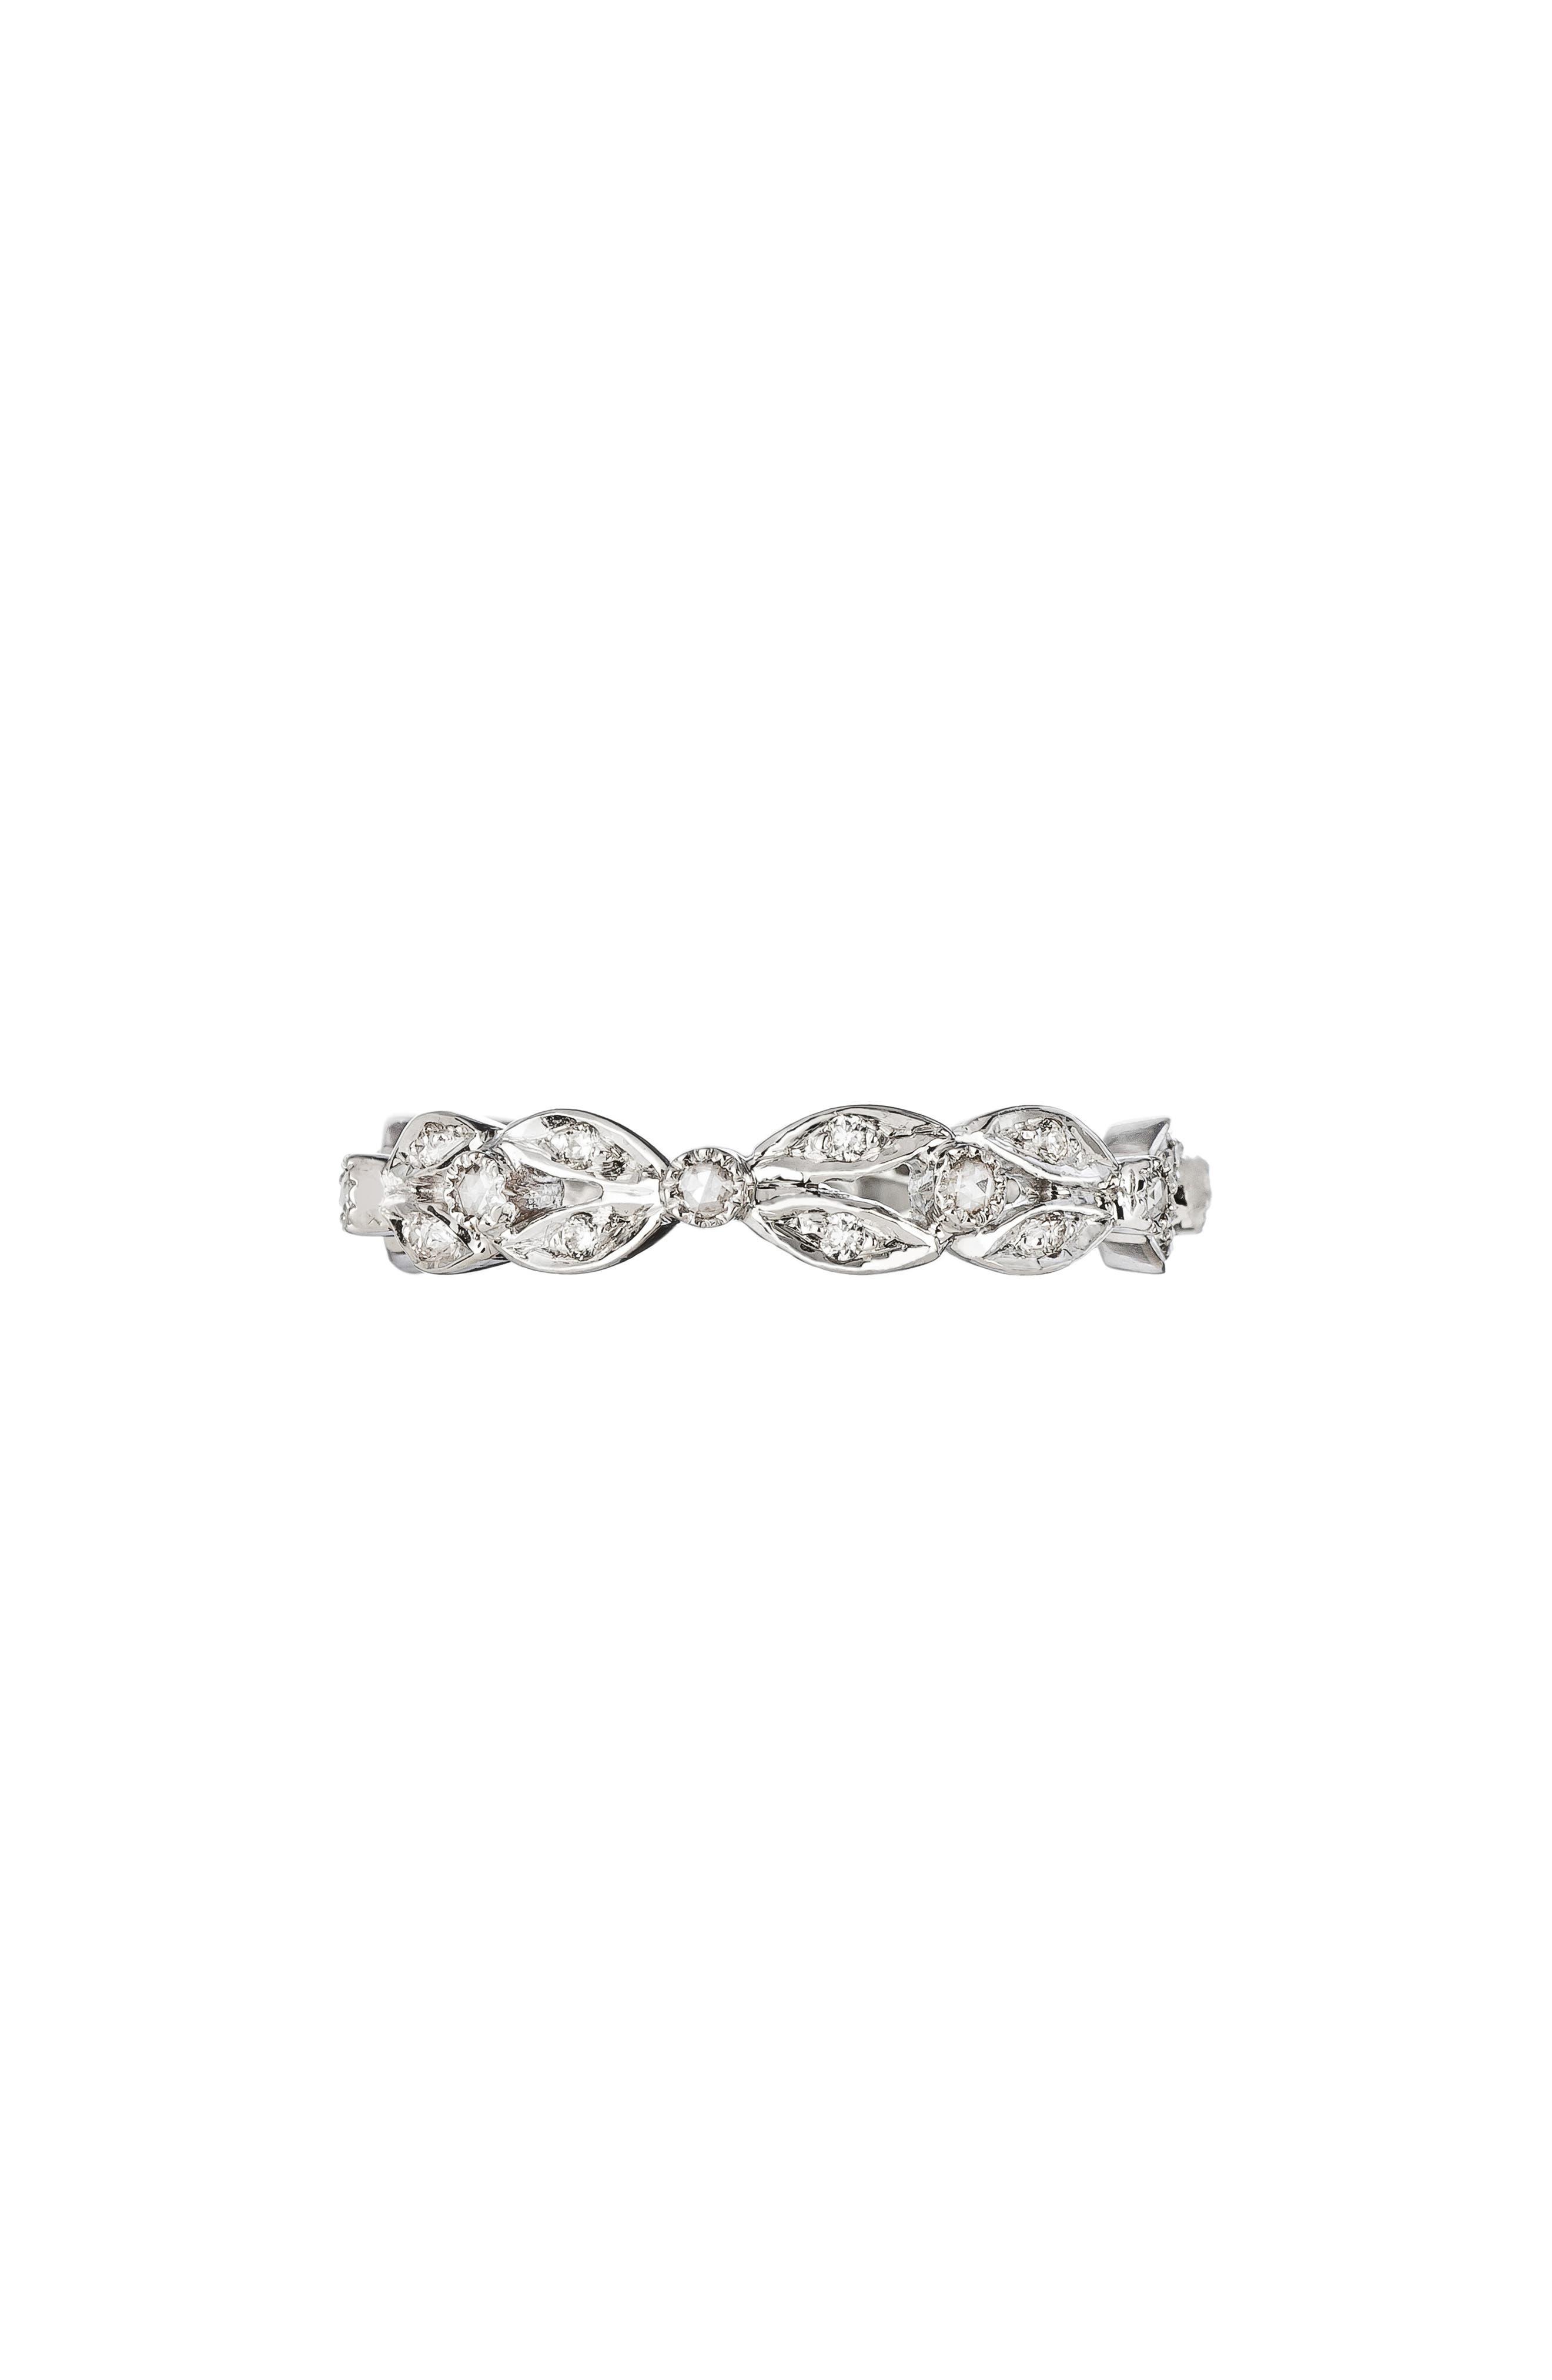 Diamond Garland Band Ring,                         Main,                         color, WHITE GOLD